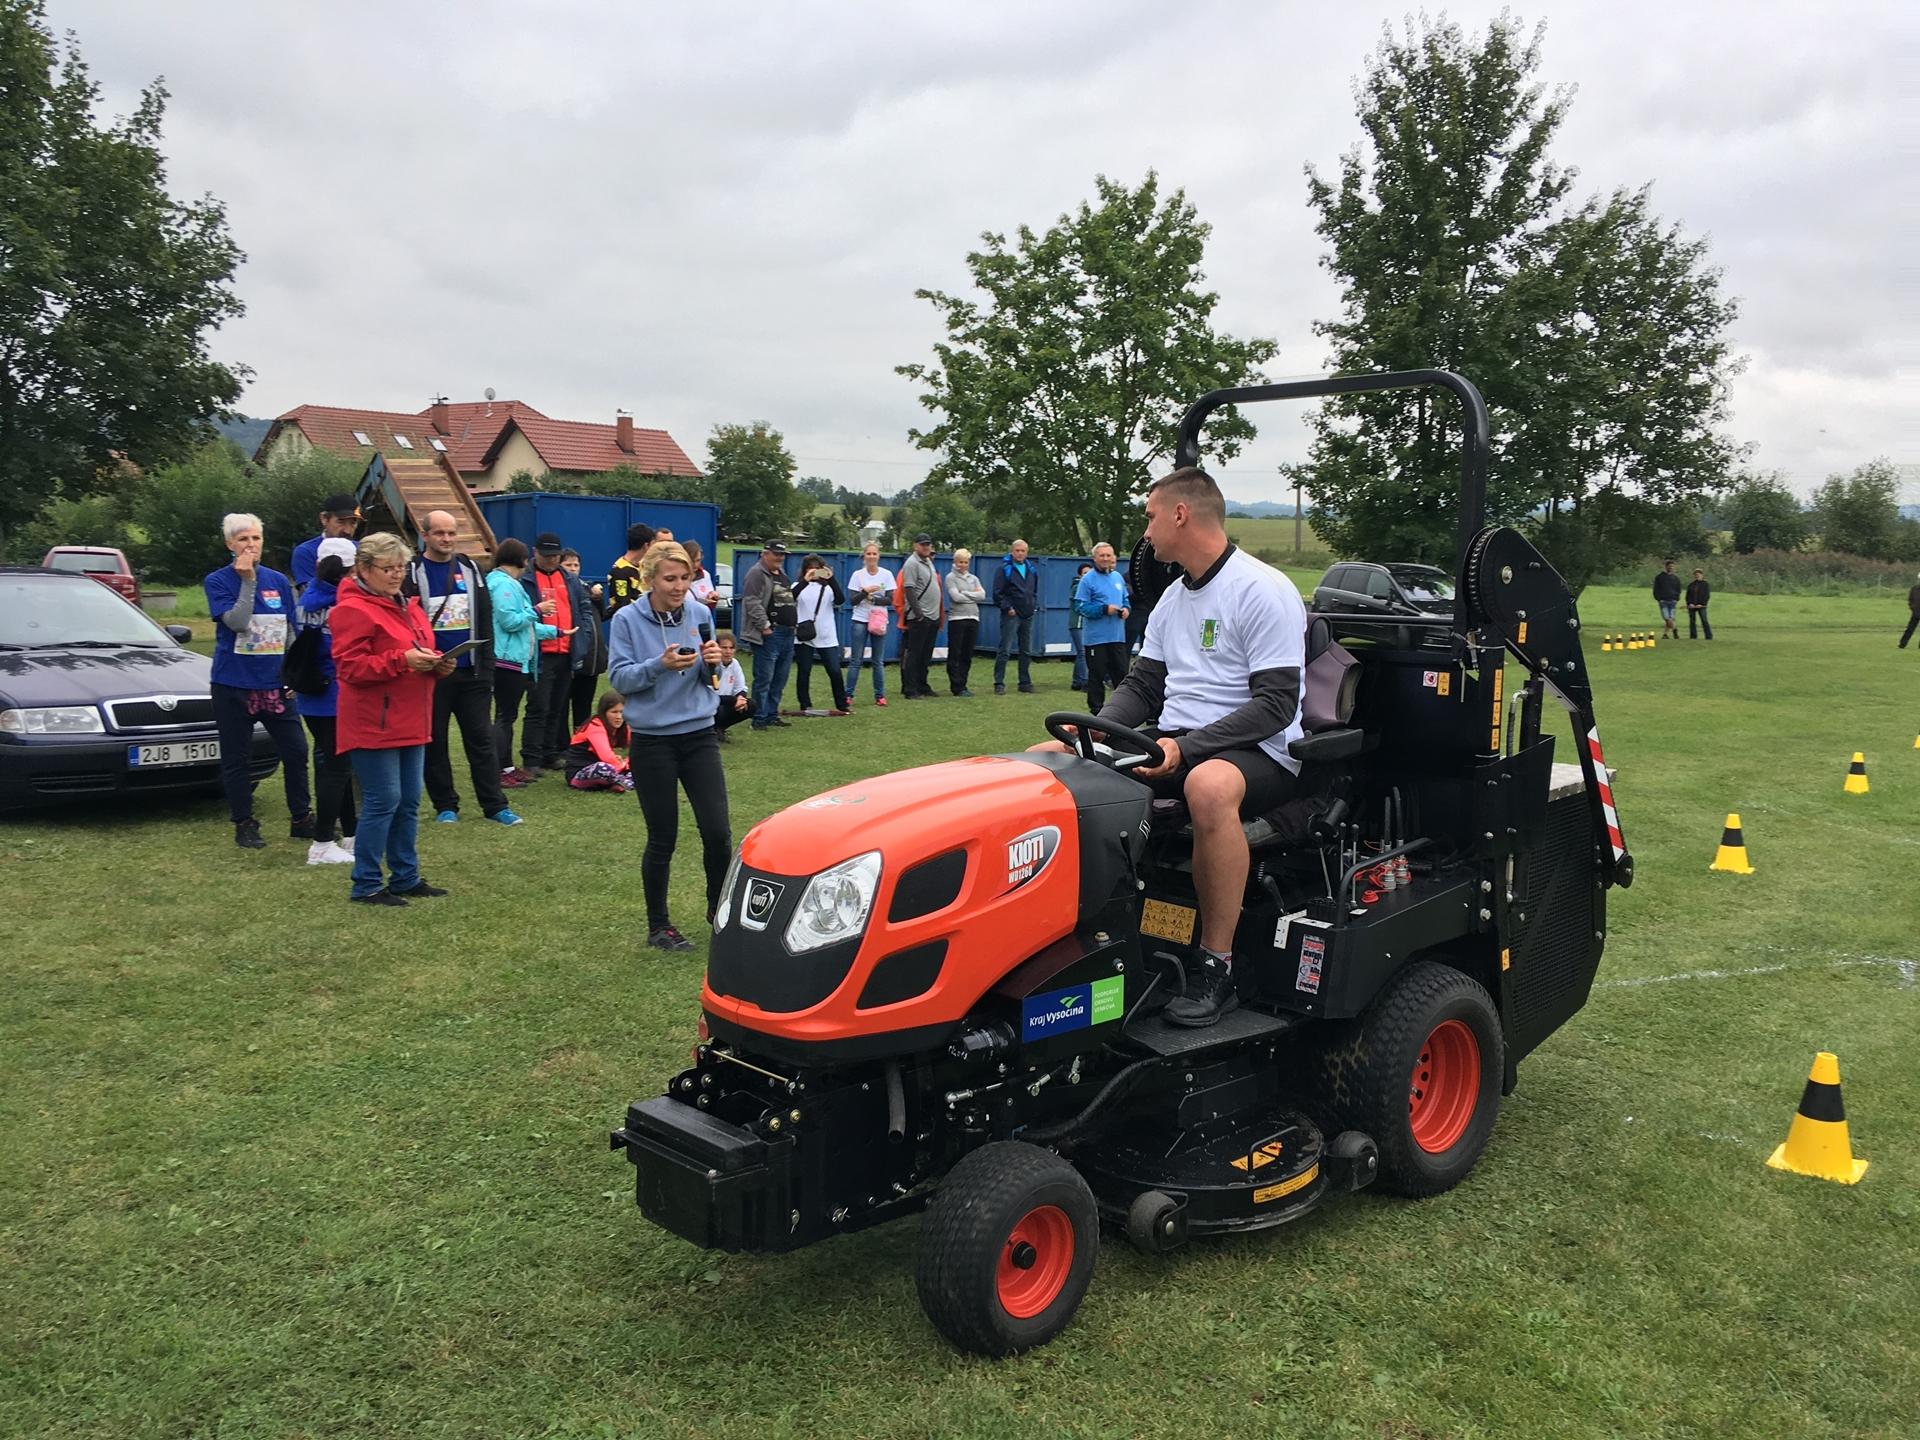 Traktorova-sekacka-Kioti-WD1260-na-Setkani-starosu-Malec-2019-(1).JPG